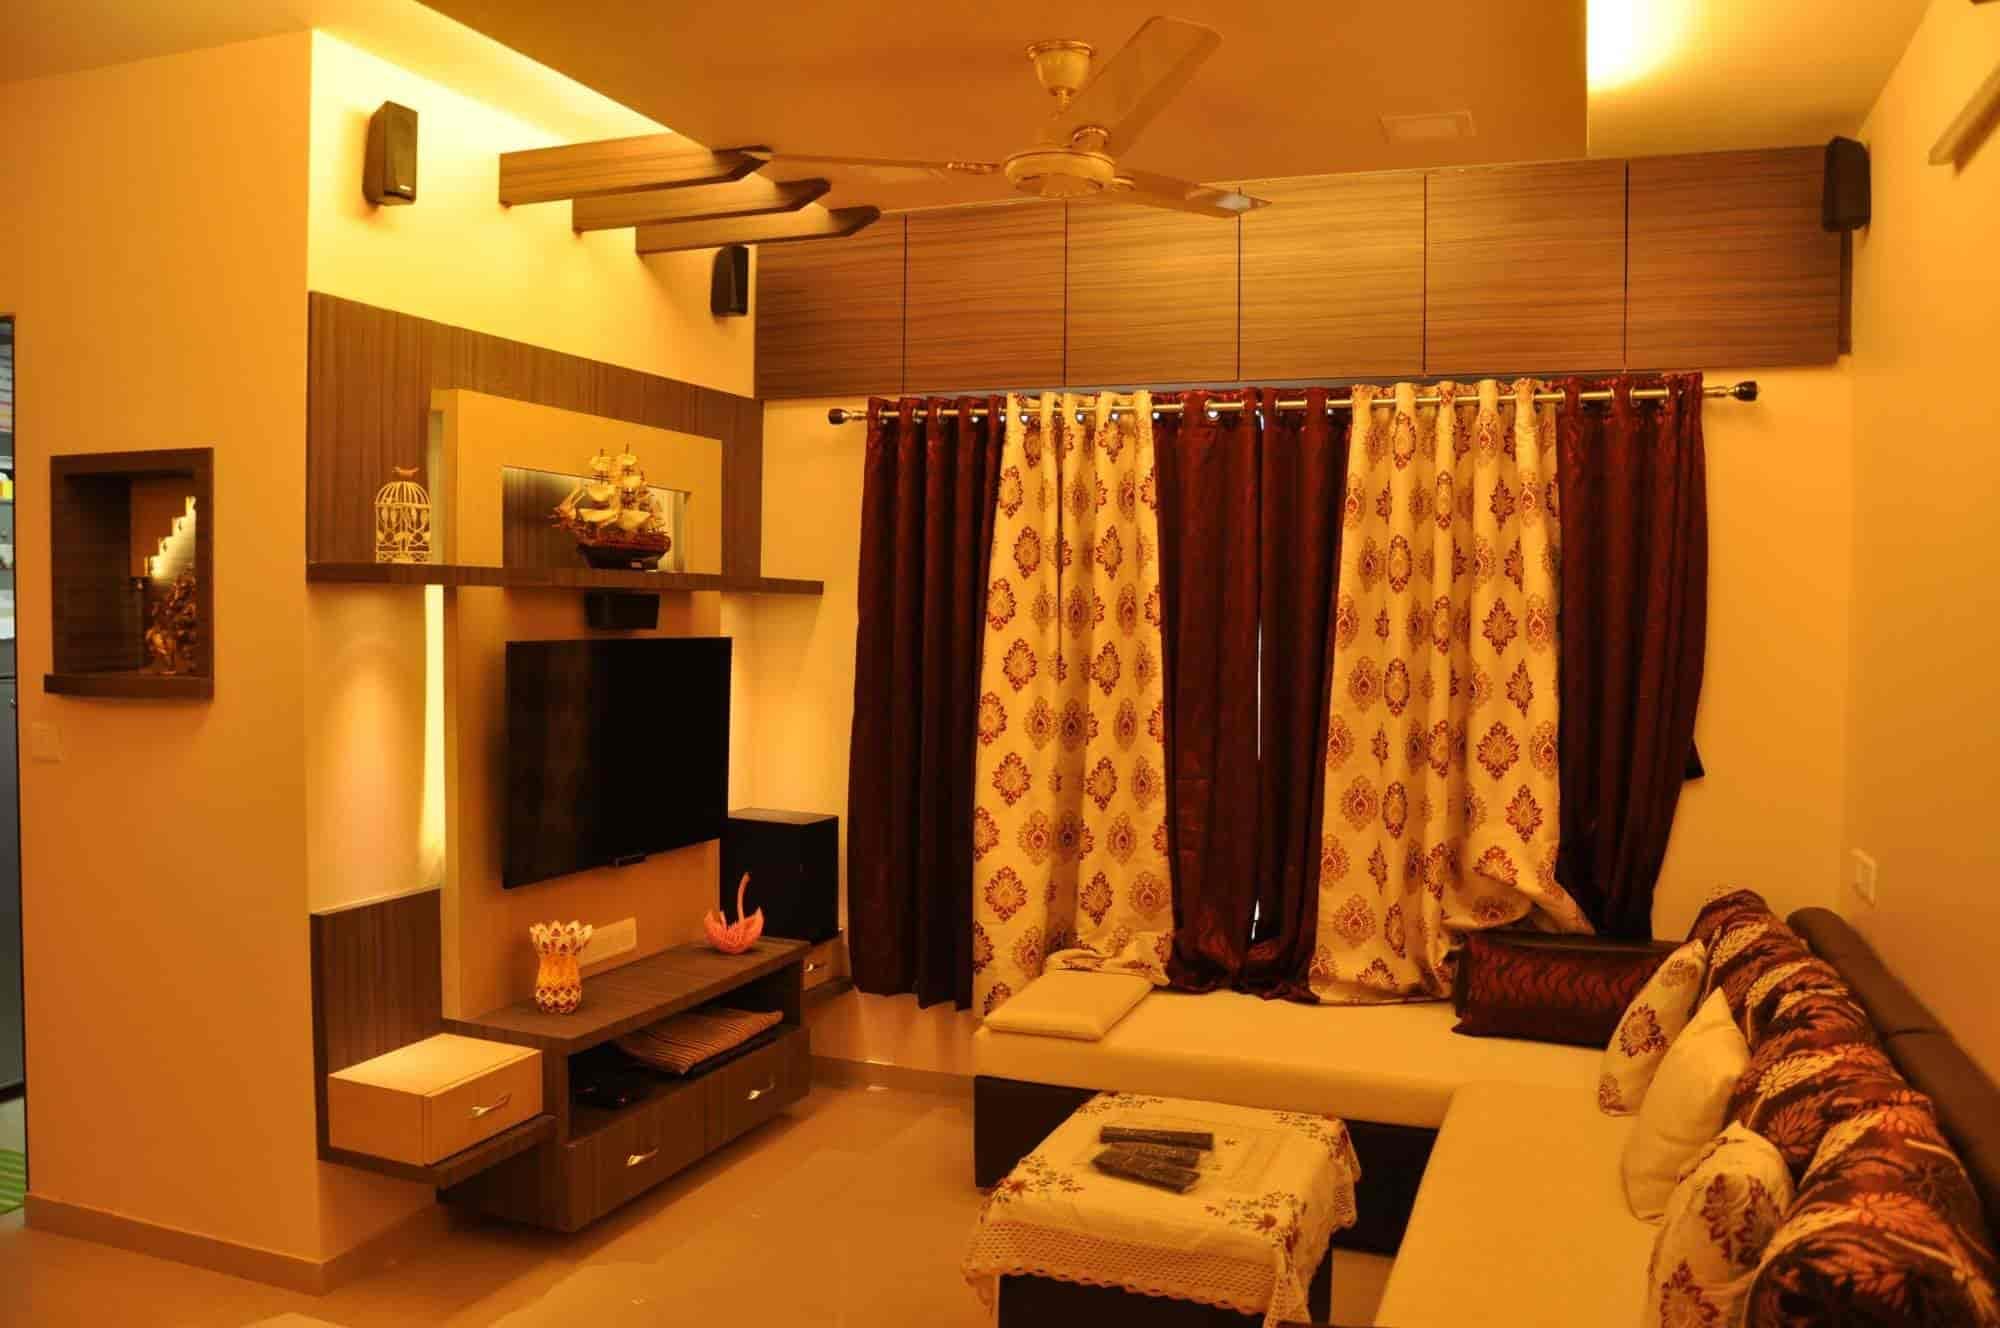 Job for fresher interior designer in thane Vacancy for interior designer